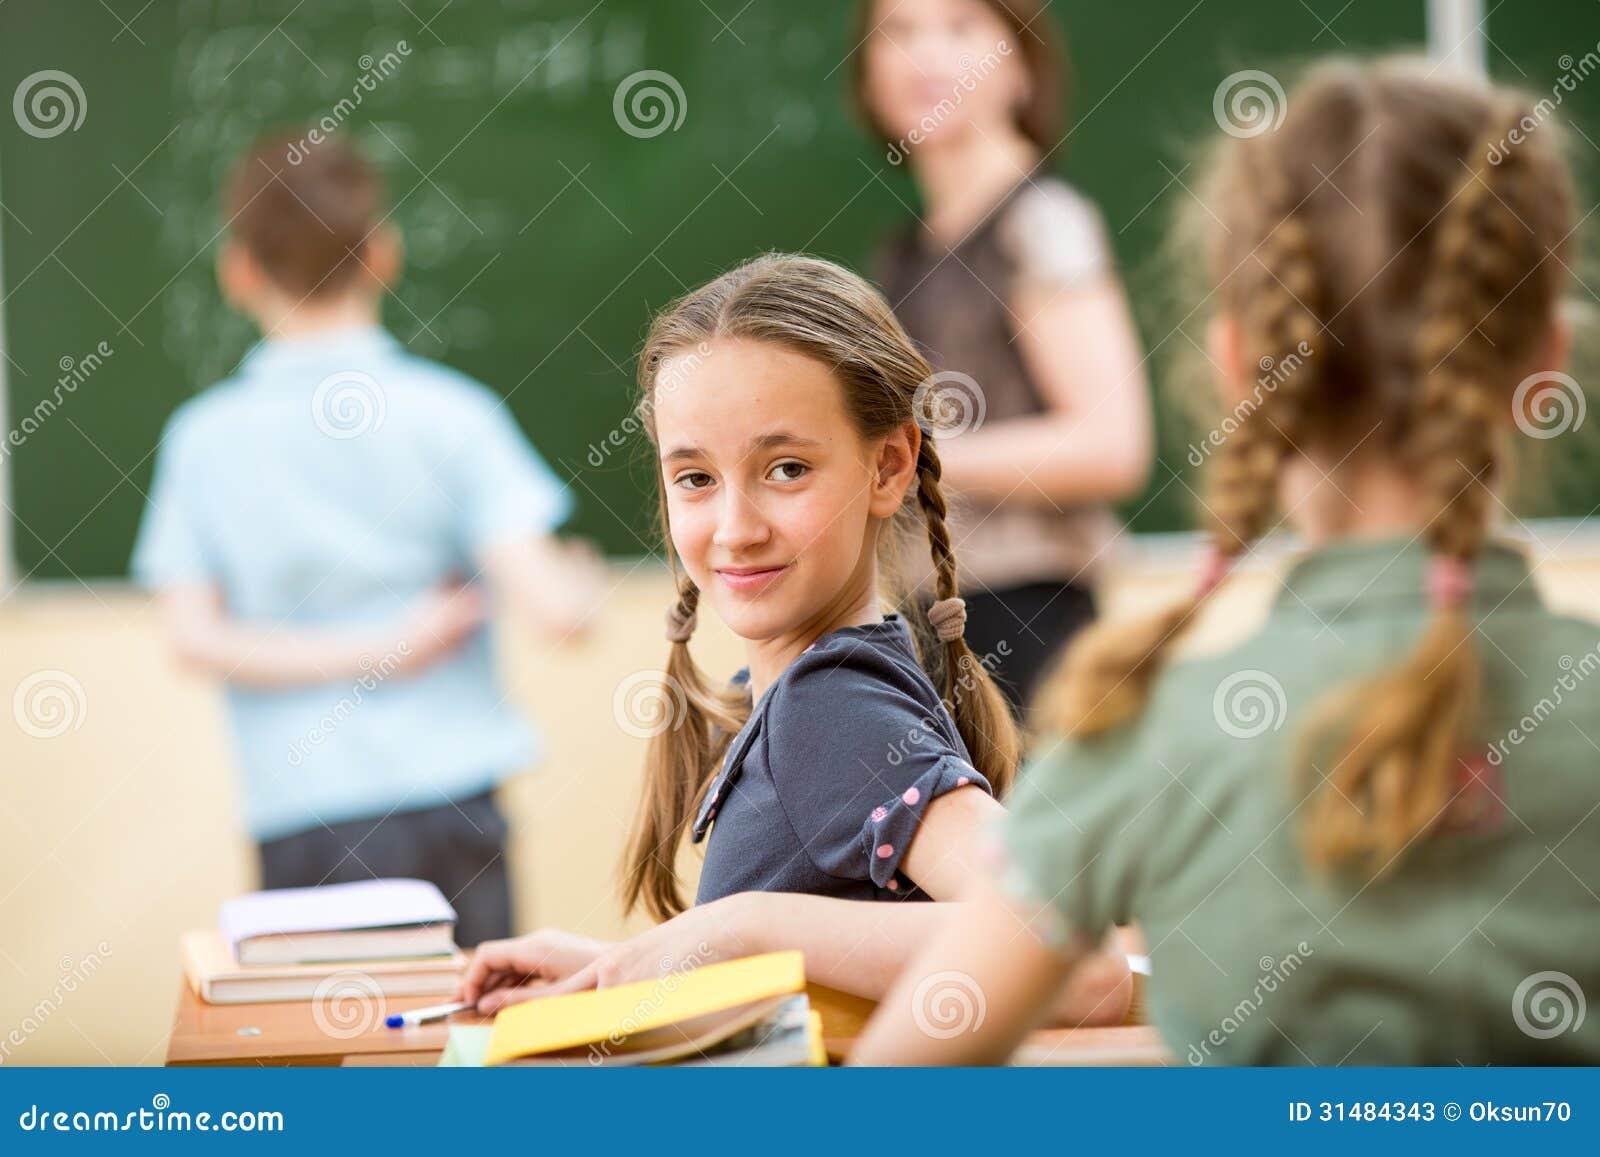 School children at lesson